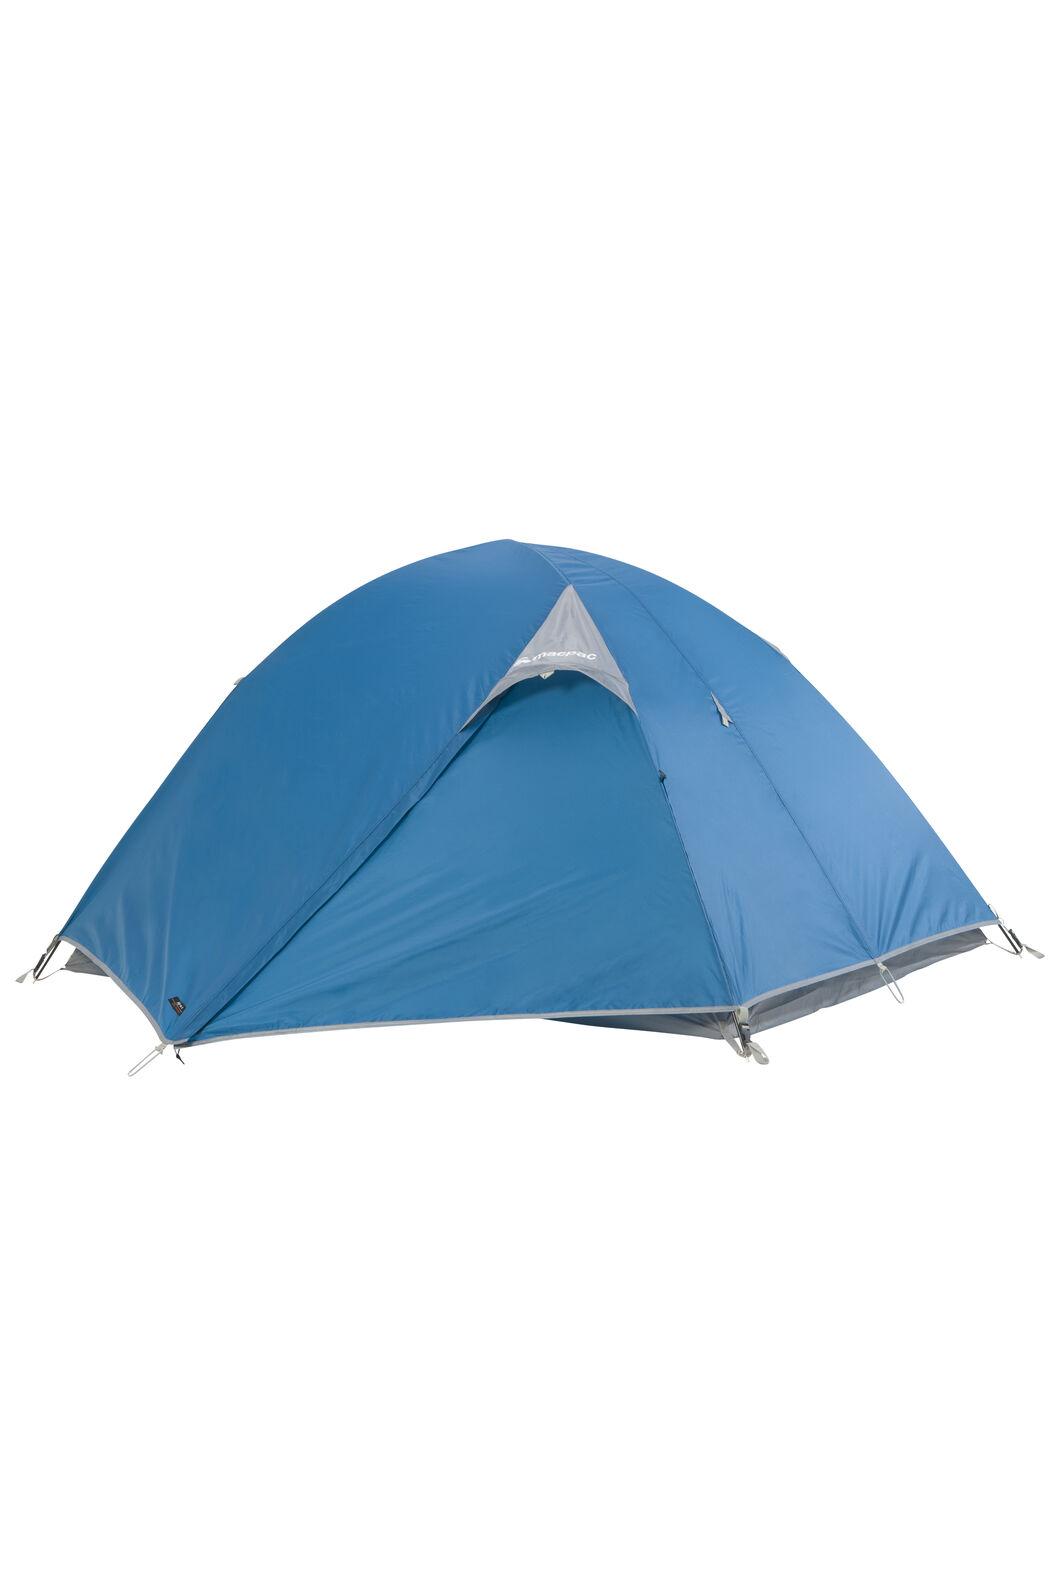 Macpac Apollo Camping Tent, Imperial Blue, hi-res